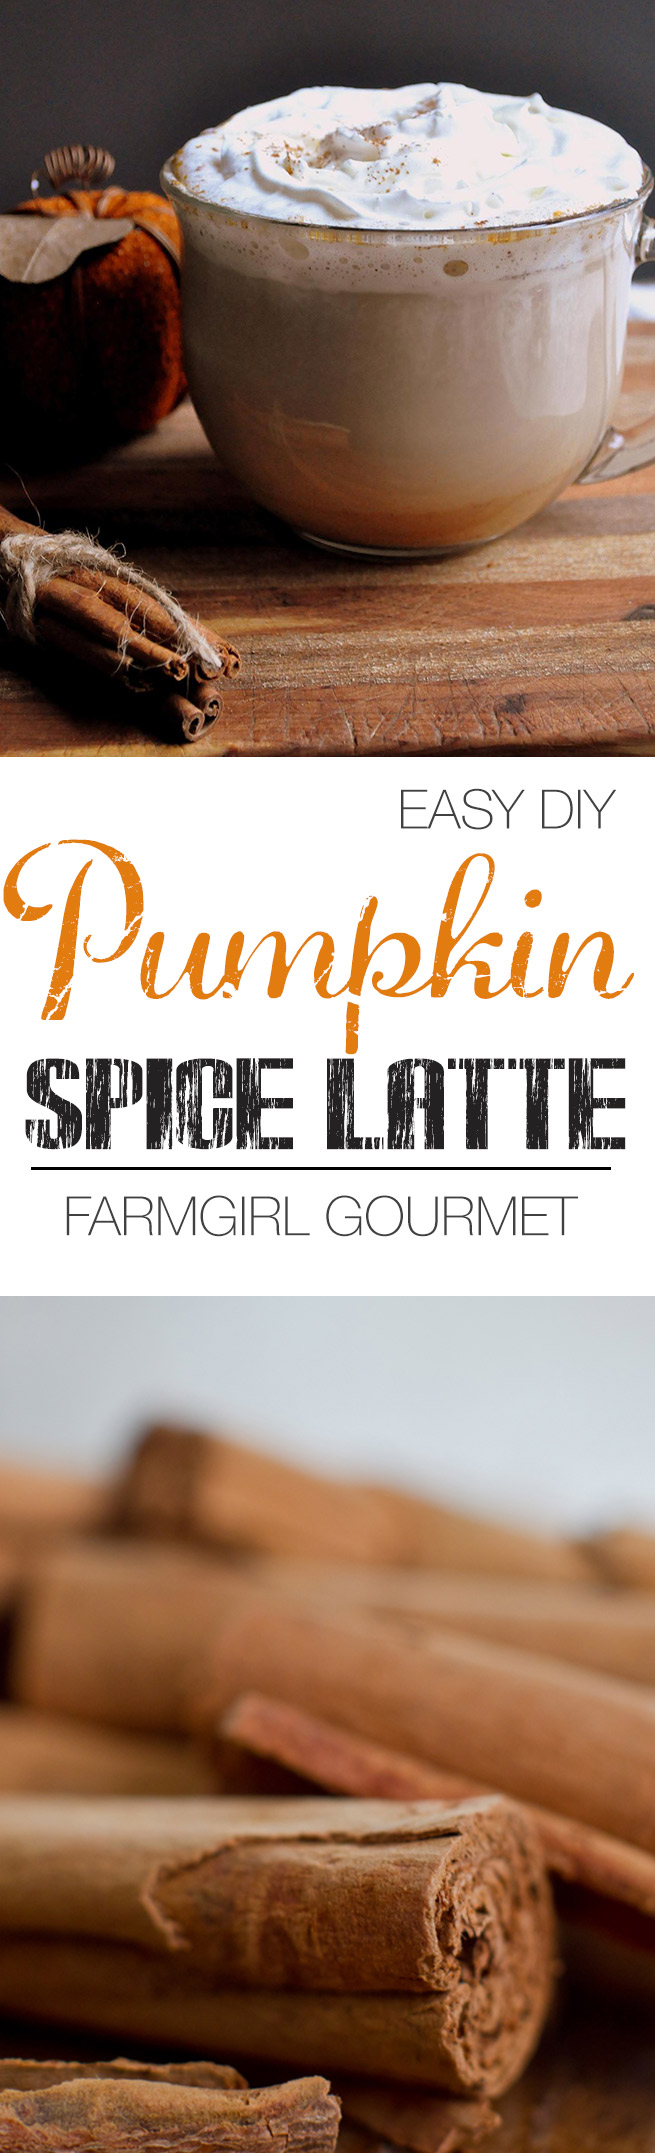 FarmgirlGourmet-Pumpkin-Spice-Latte